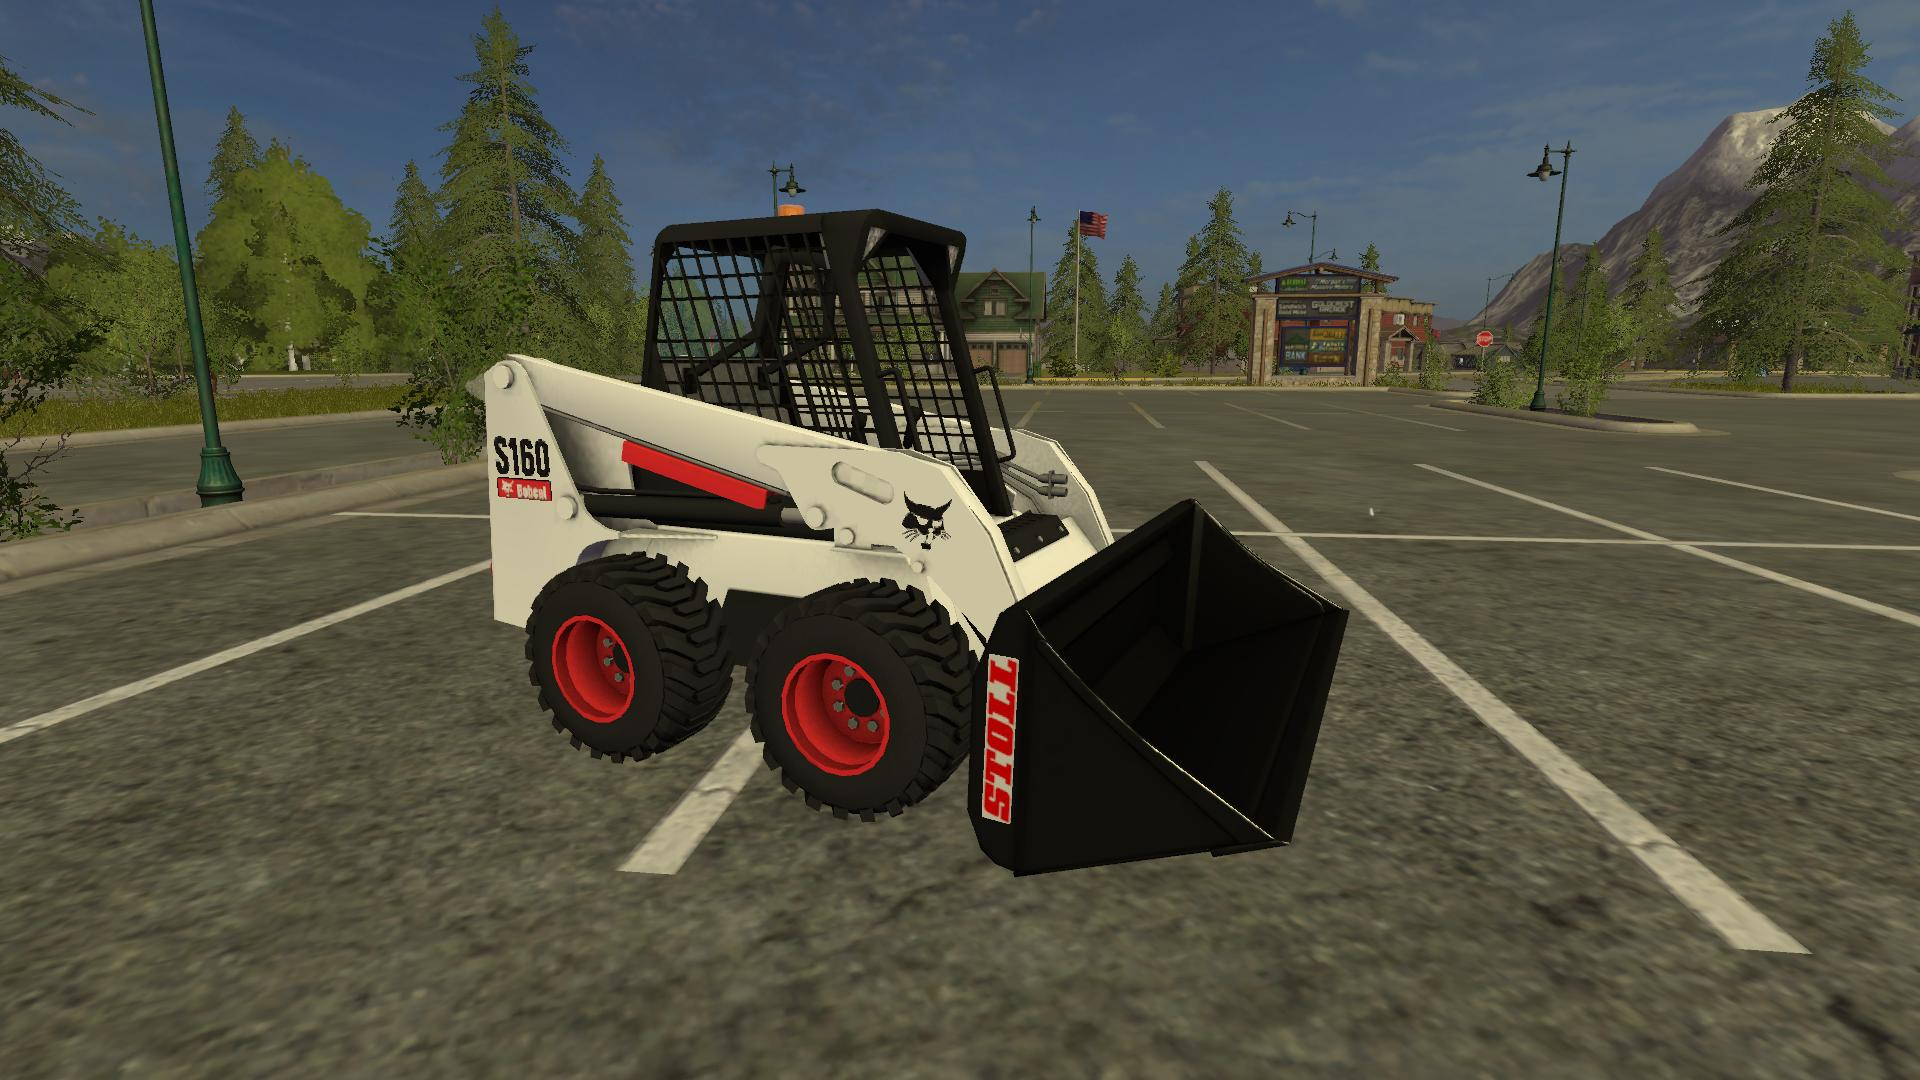 BOBCAT S160 V2 3 MOD - Farming simulator 17 / 2017 mod